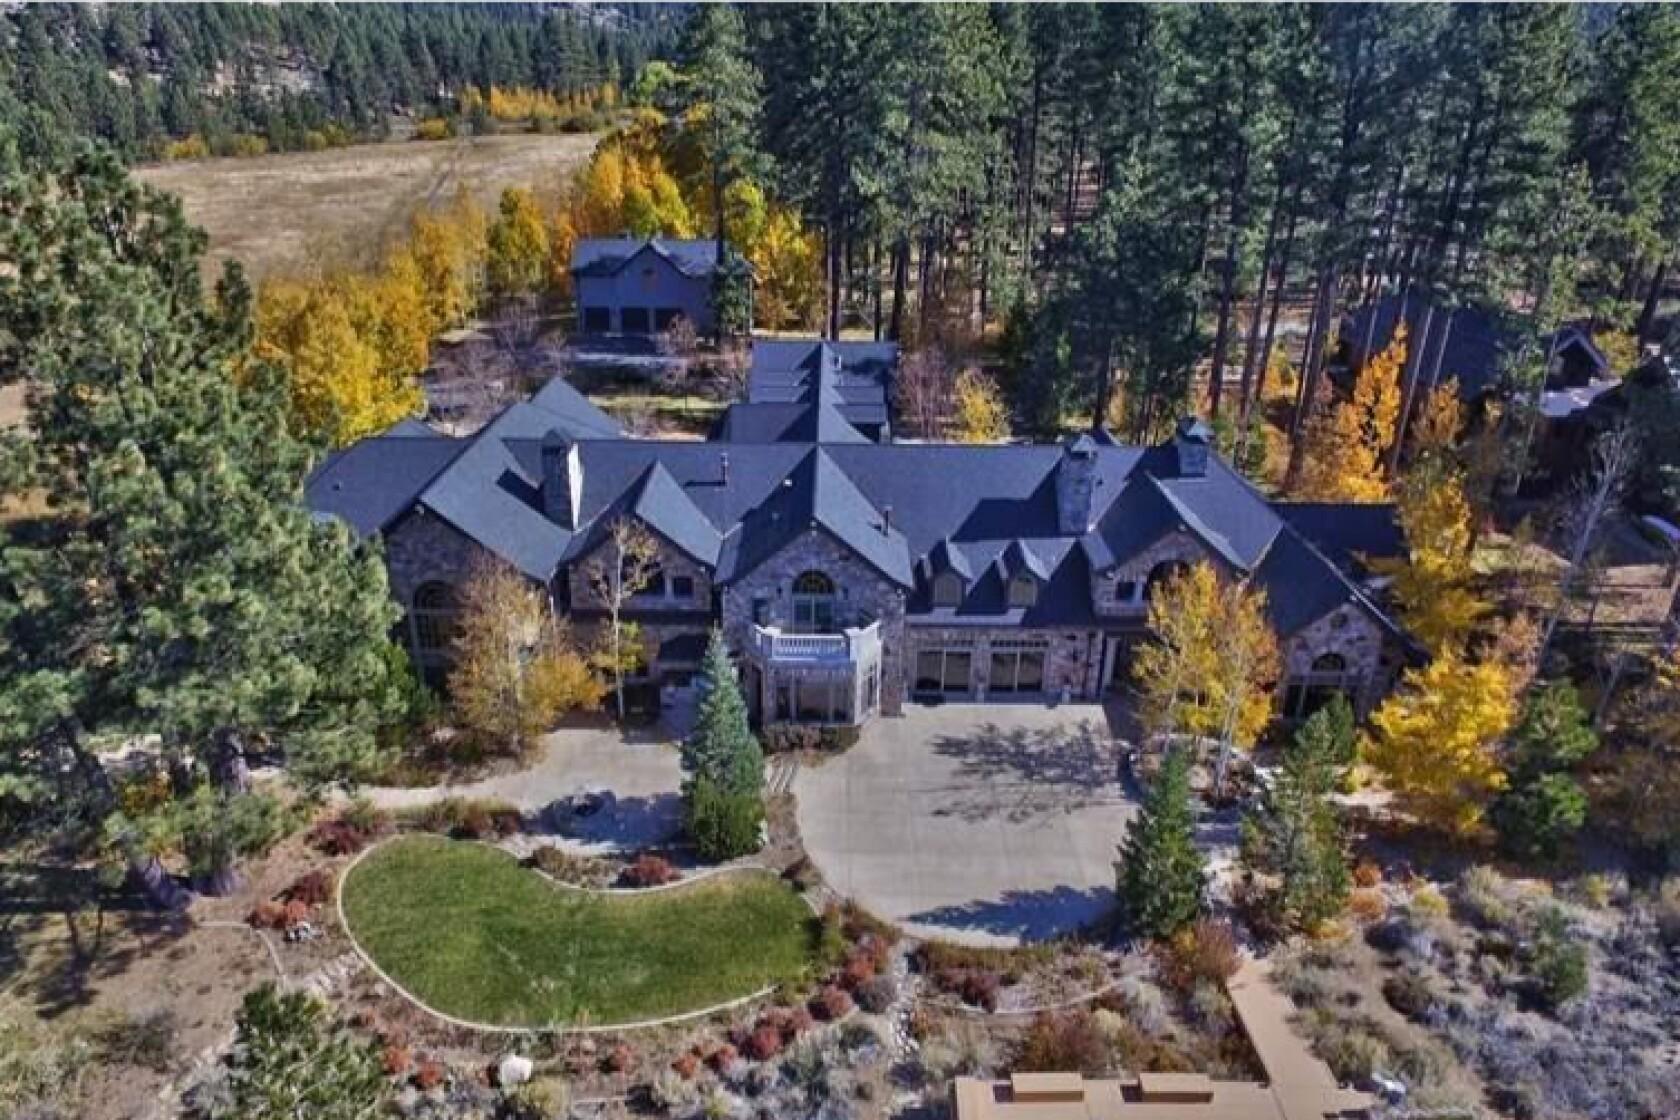 Lake Tahoe Ranch Where Bonanza Was Filmed Sells For 38 Million Los Angeles Times